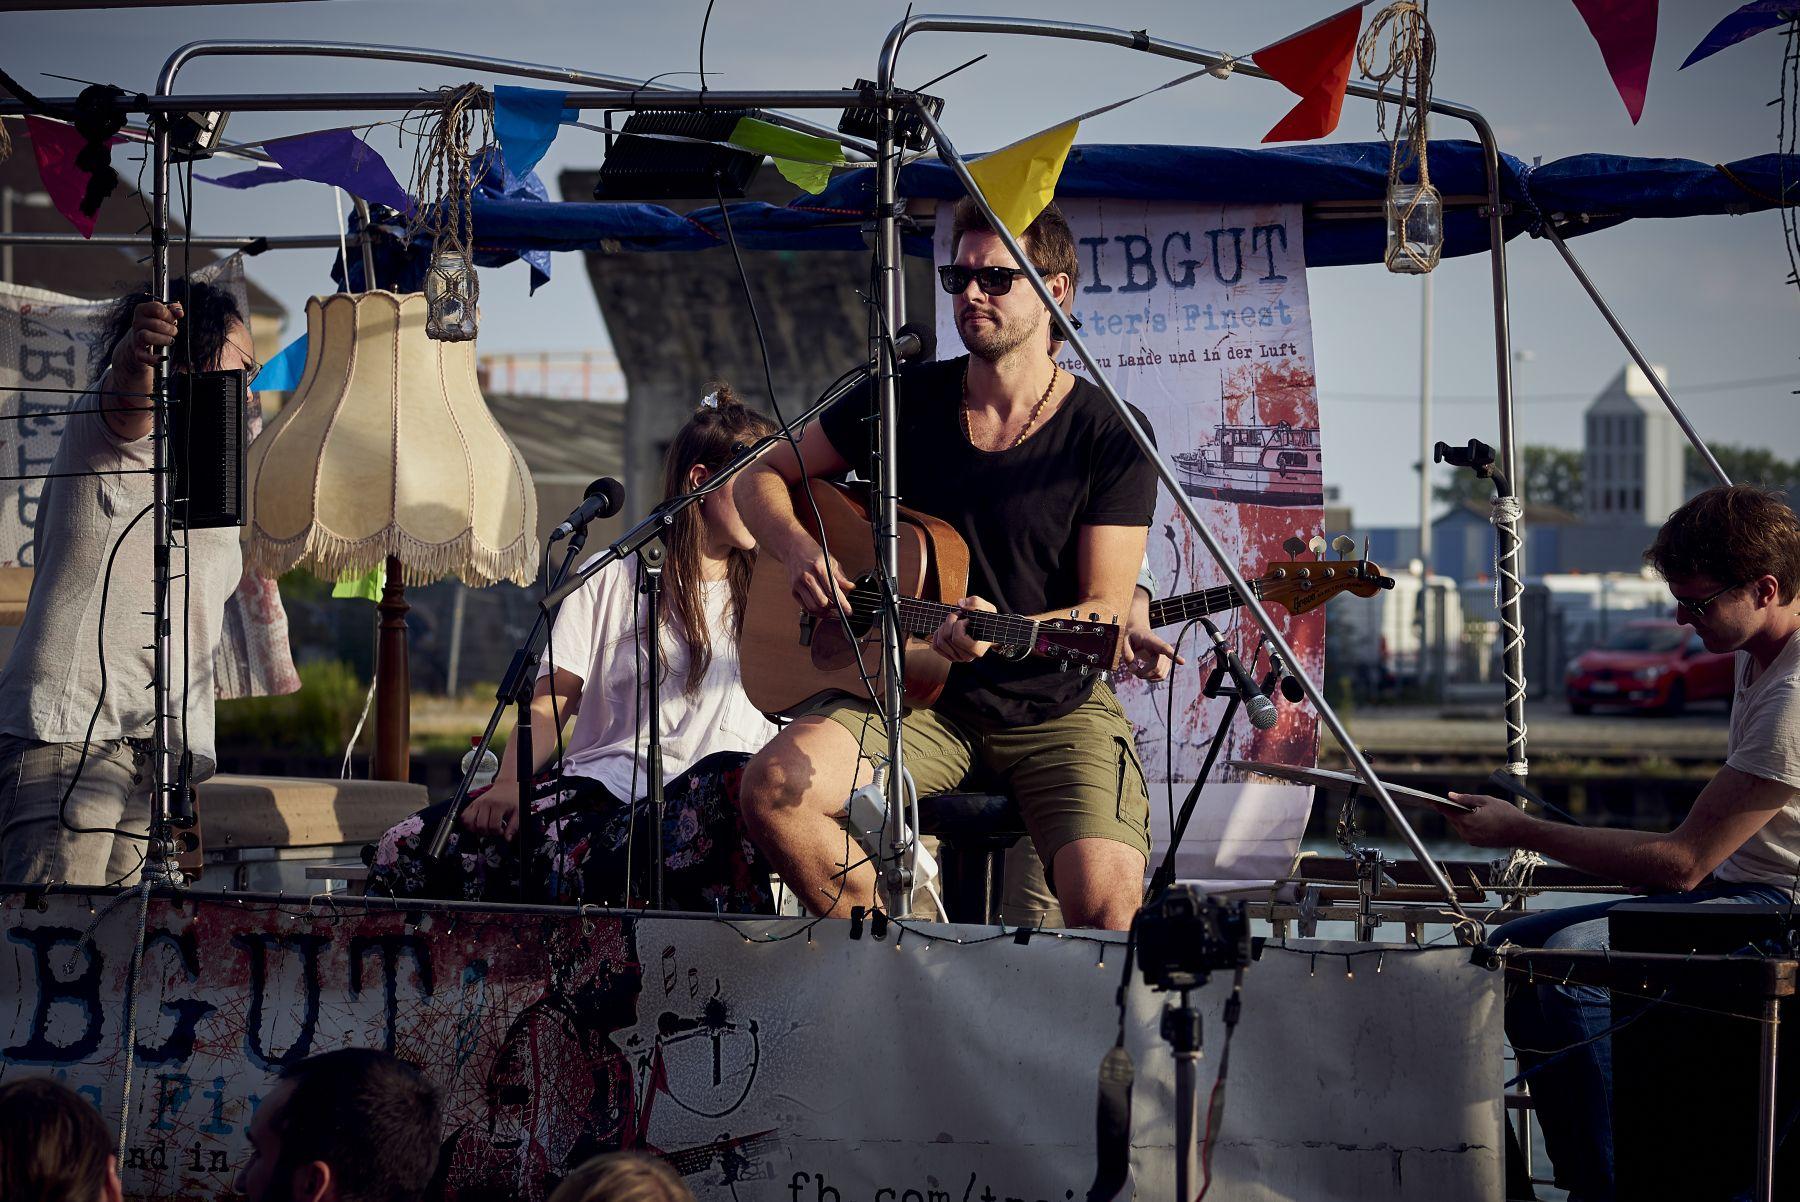 Treibgut - Hafen -1-2019- Jan Felix Band